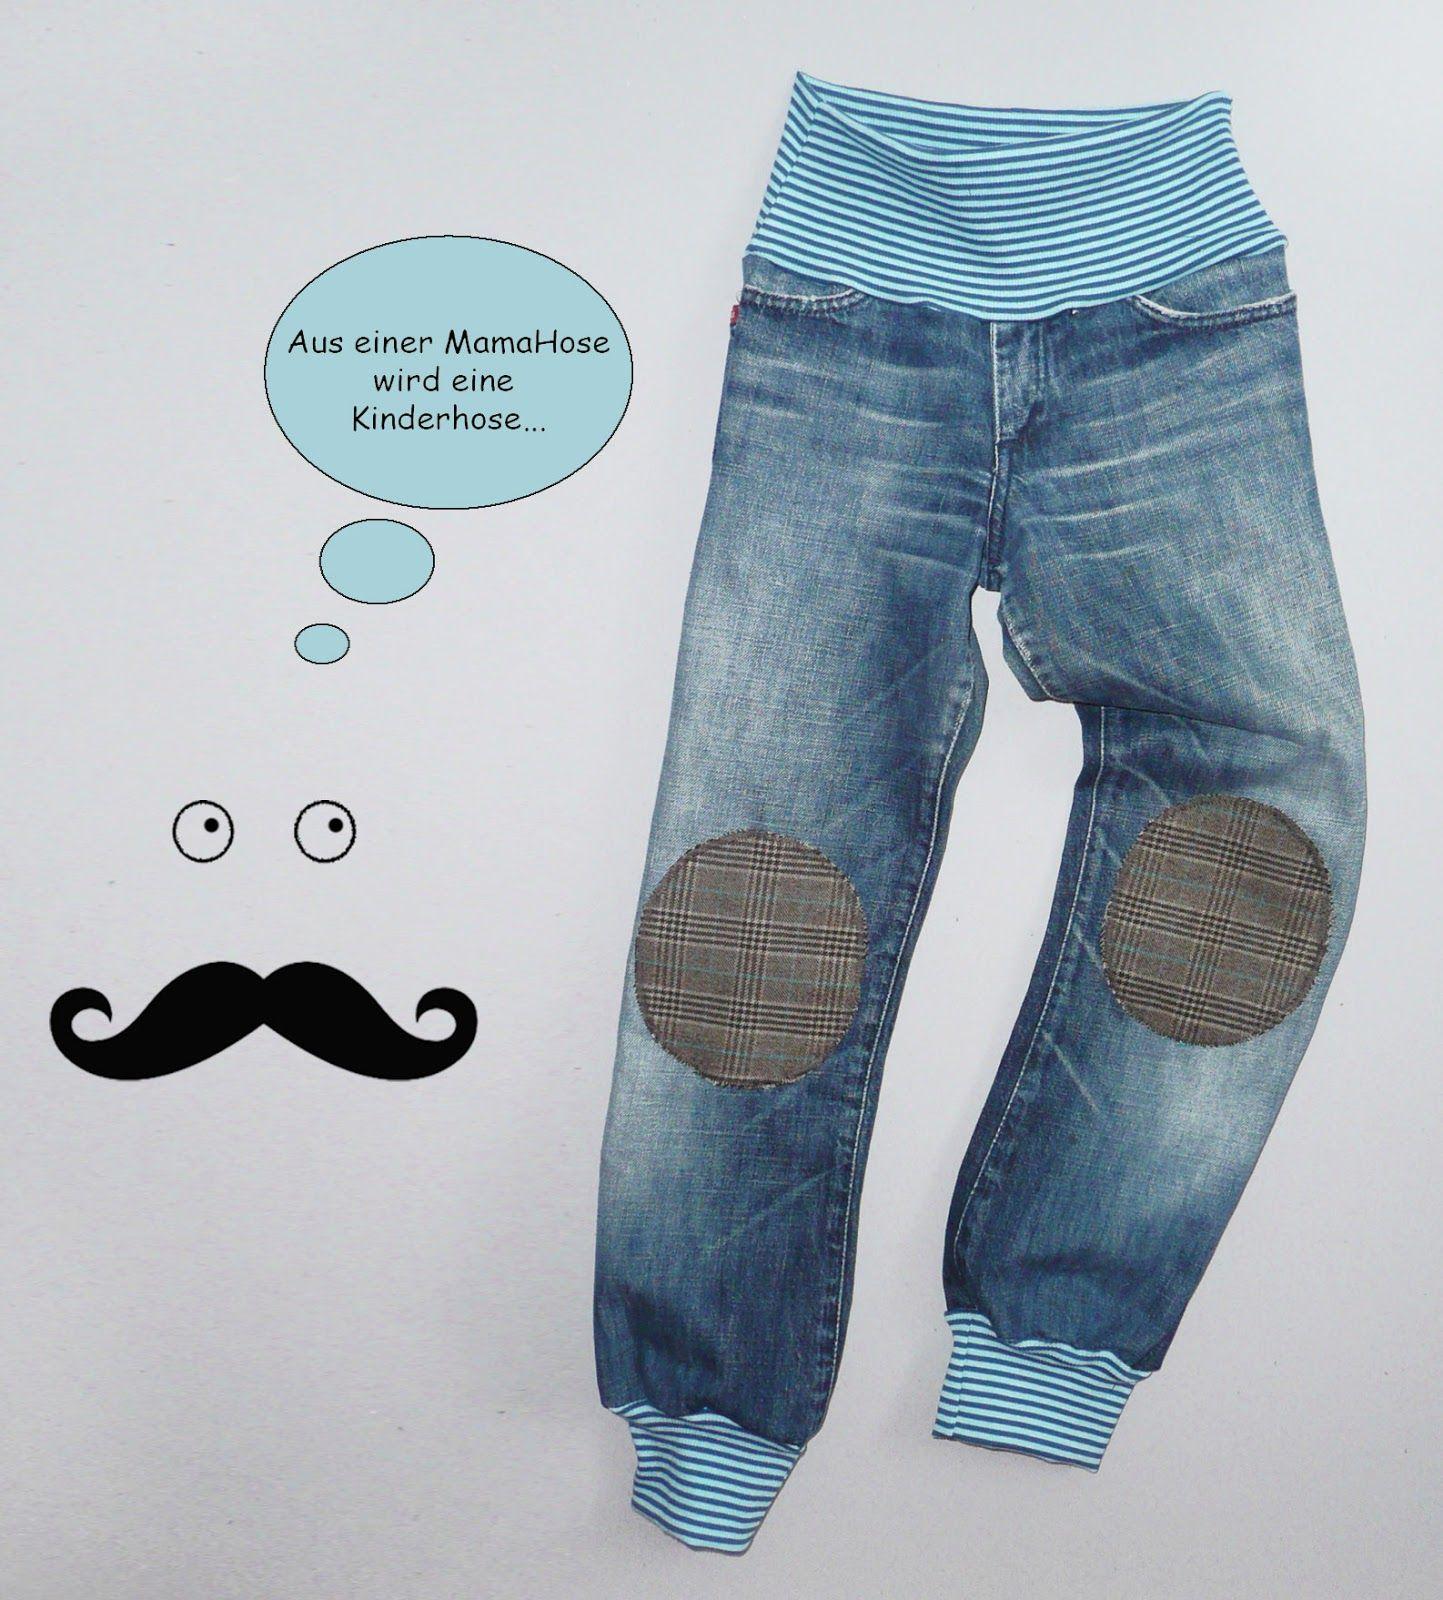 zwischen pol upcycling von mamahose zu kinderhose jeans recycling pinterest pol. Black Bedroom Furniture Sets. Home Design Ideas